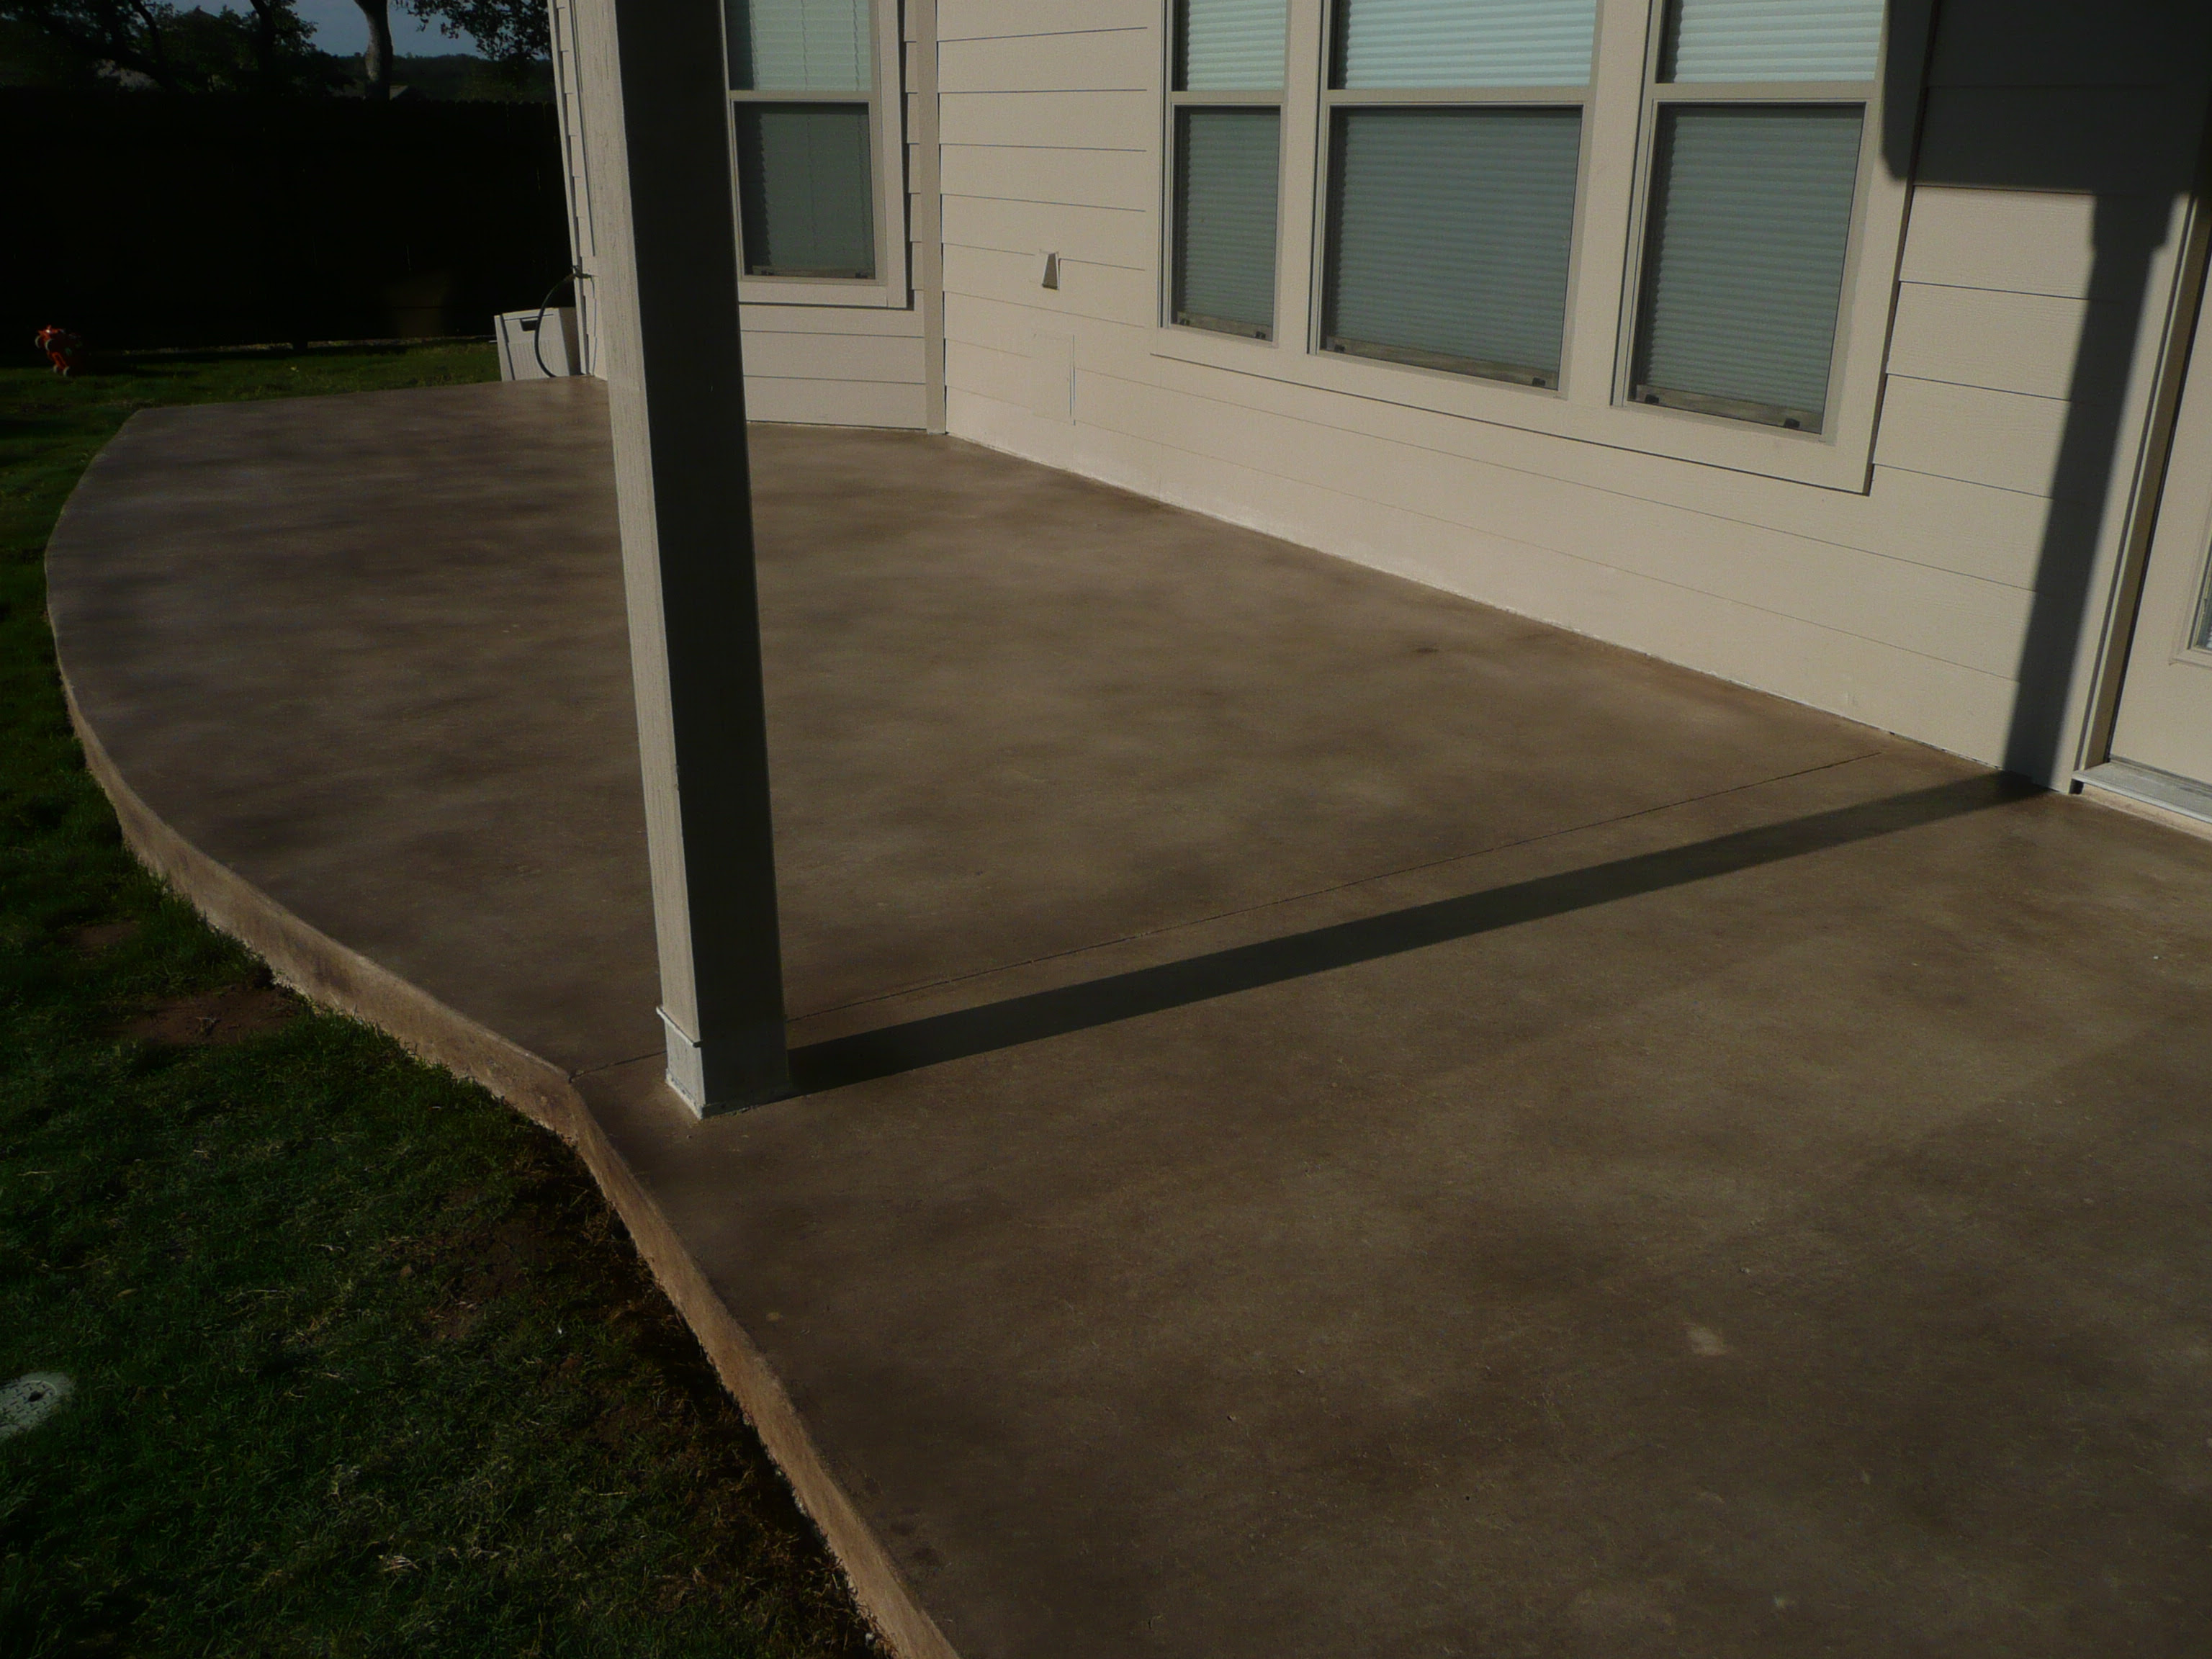 acid stain | MVL Concretes' Blog | Page 2